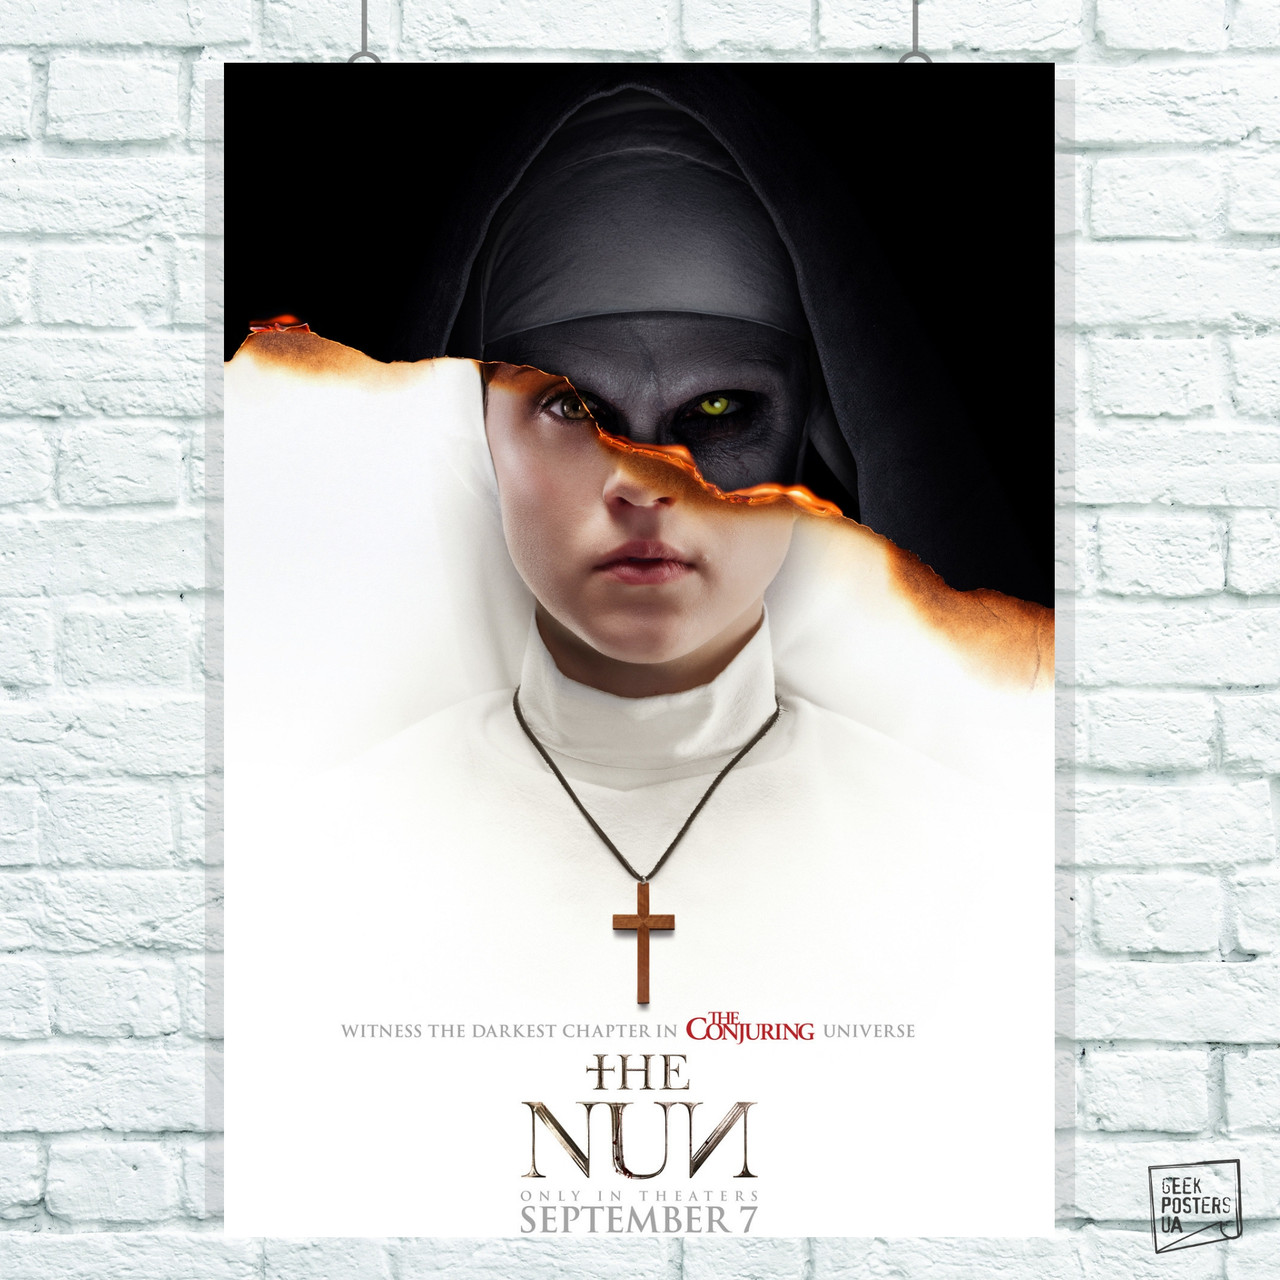 Постер Проклятие монахини (The Nun). Размер 60x40см (A2). Глянцевая бумага